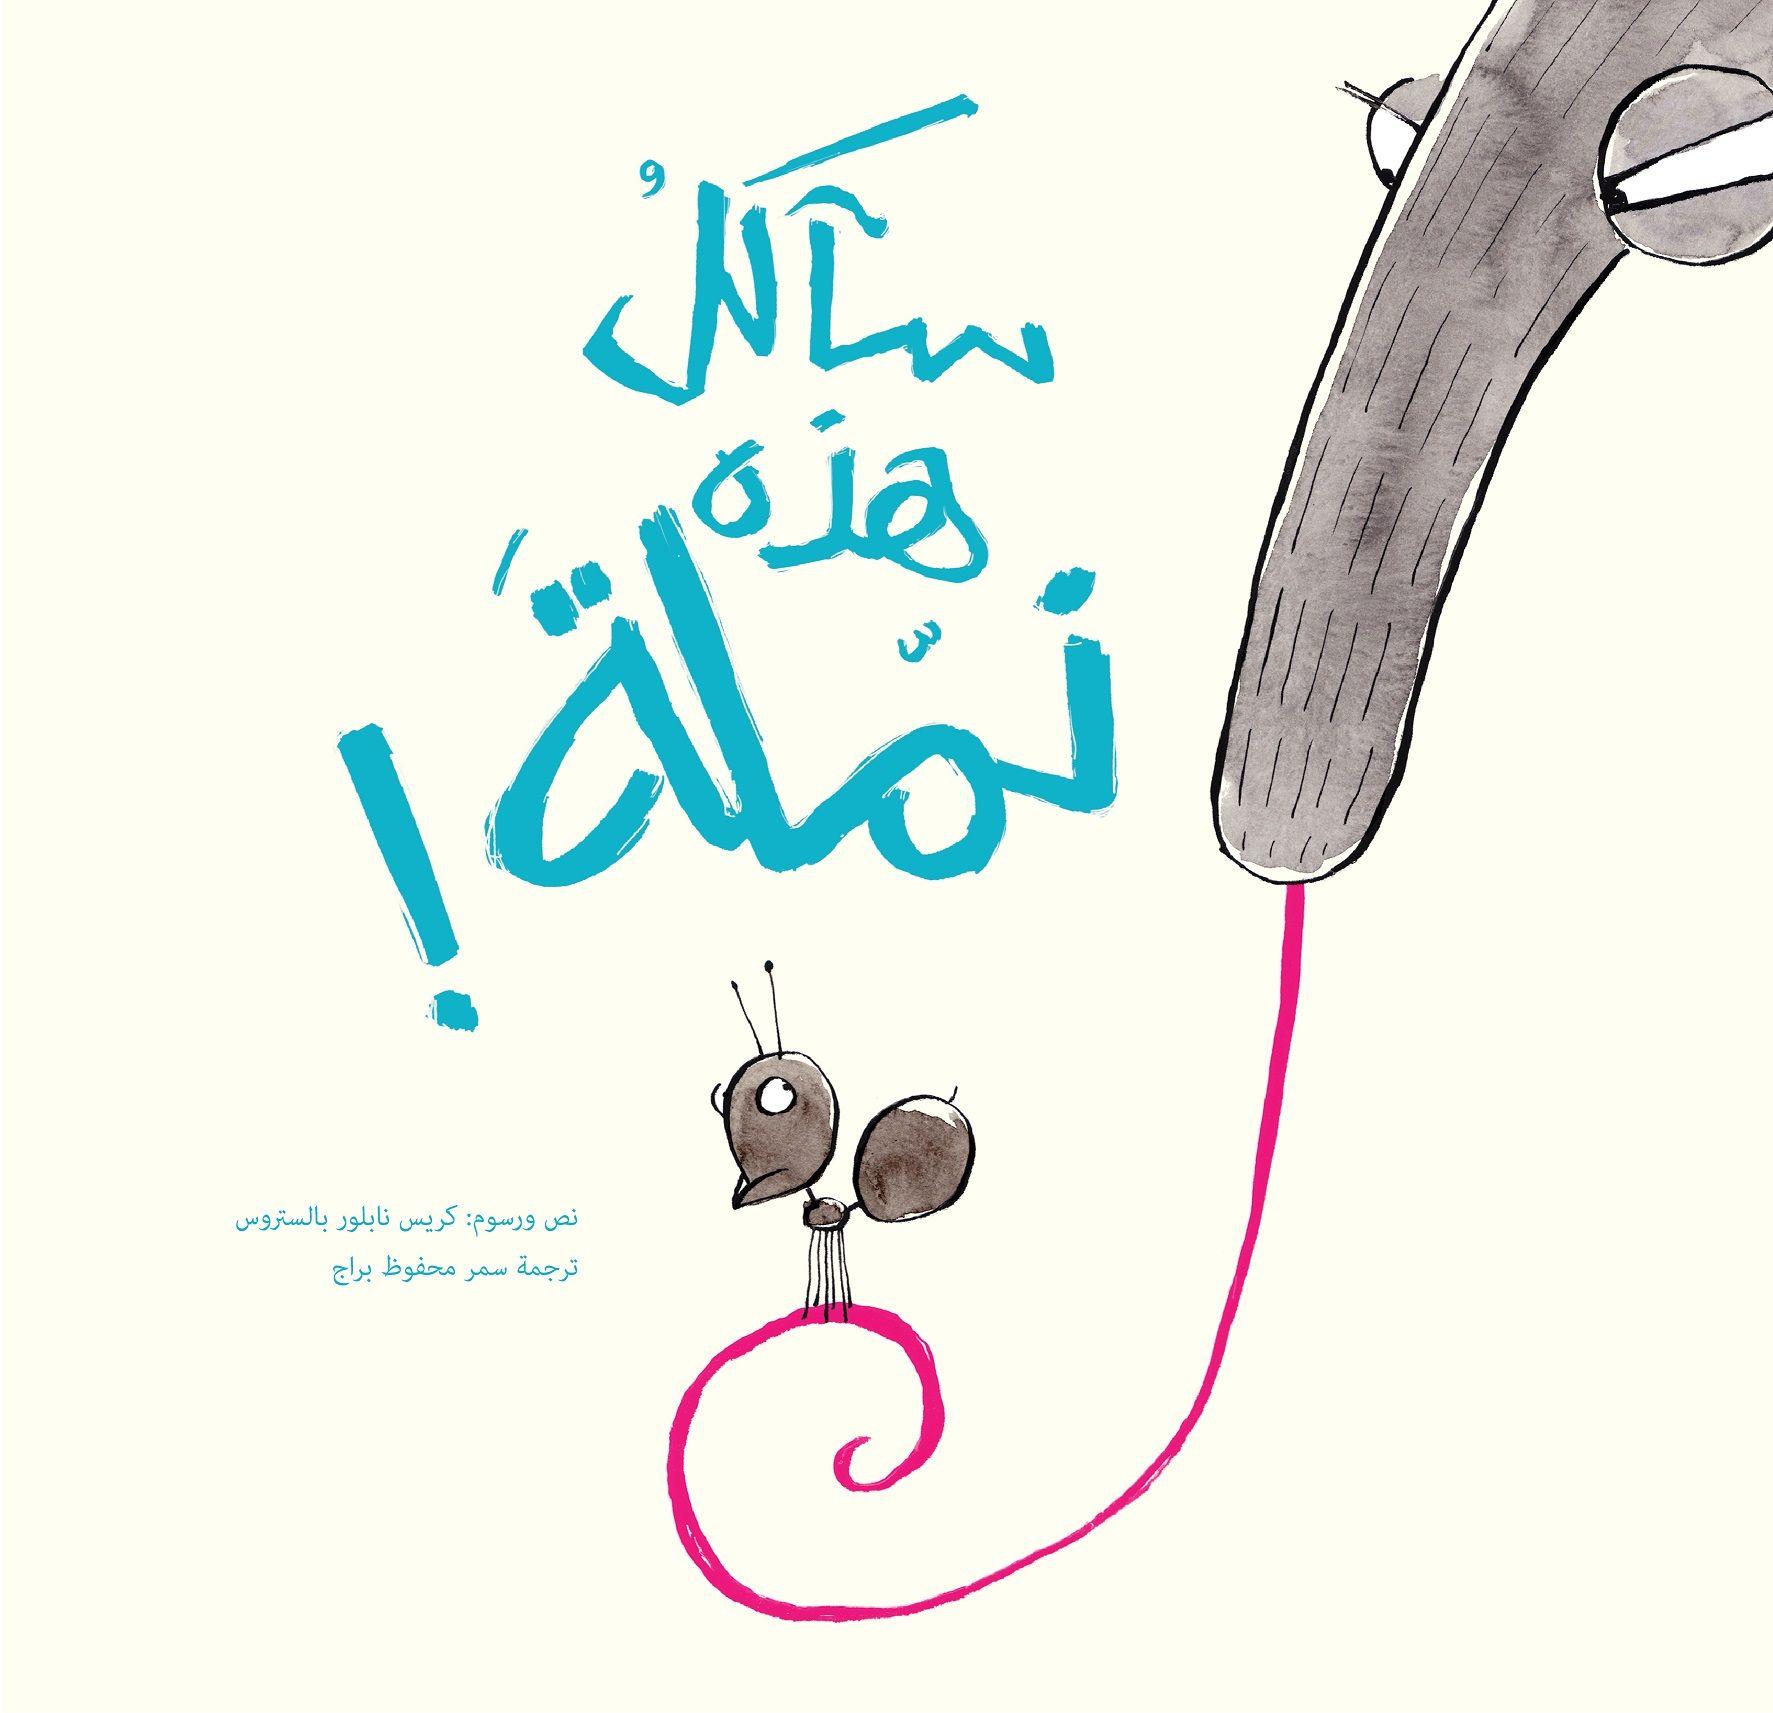 قصص أطفال آراء الأهالي Arabic Books Arabic Calligraphy Arabic